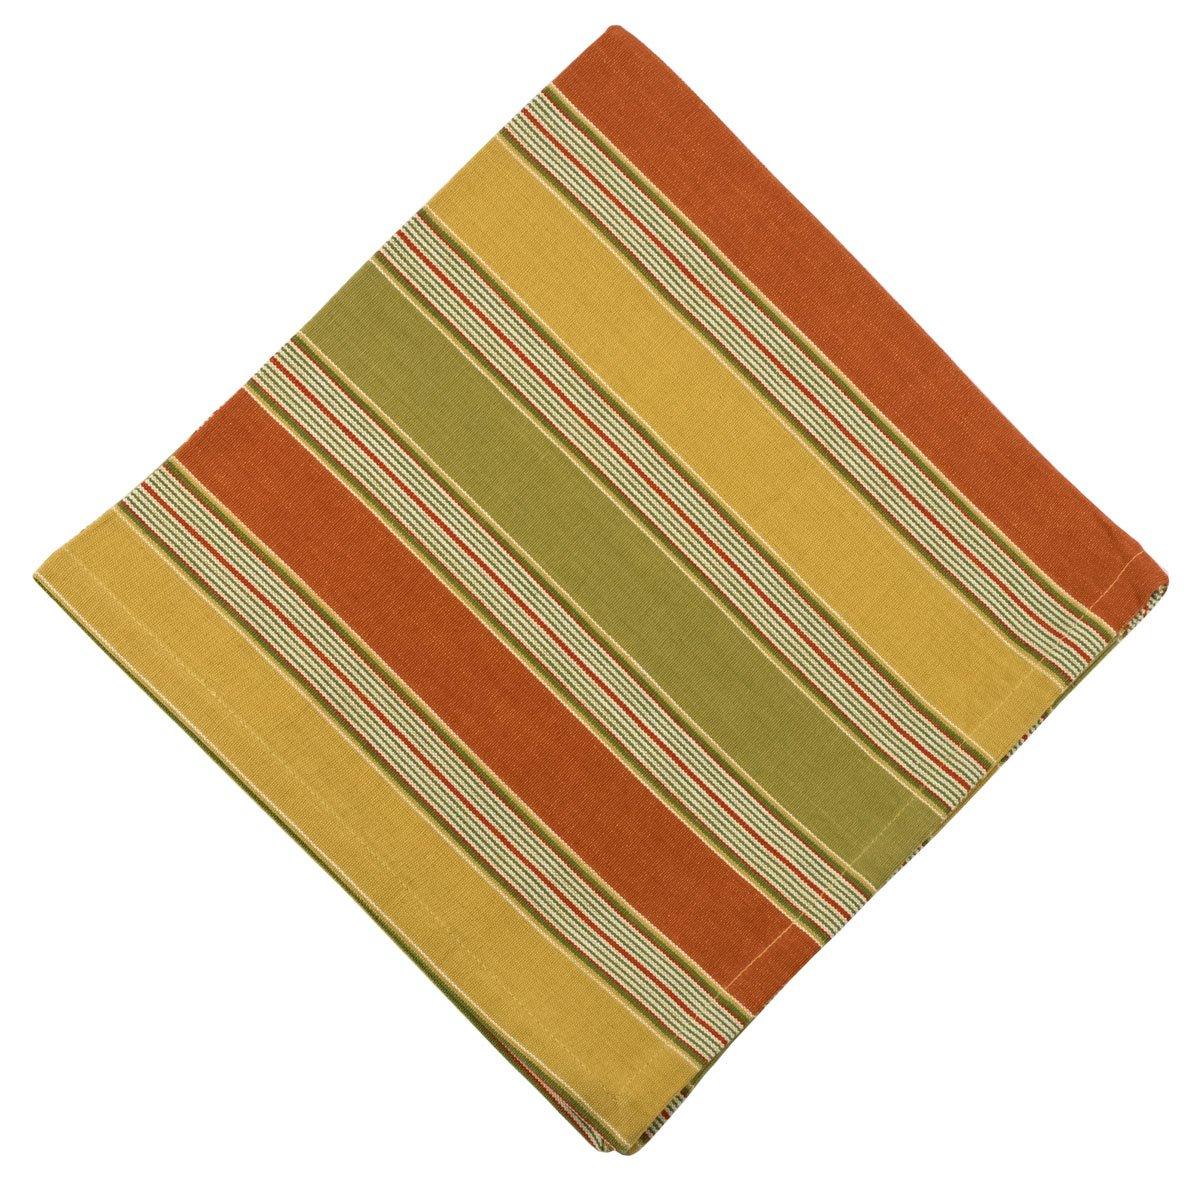 100% Cotton Yellow Rust & Green Stripe 22''x22'' Napkins, Set of 6 - Equinox